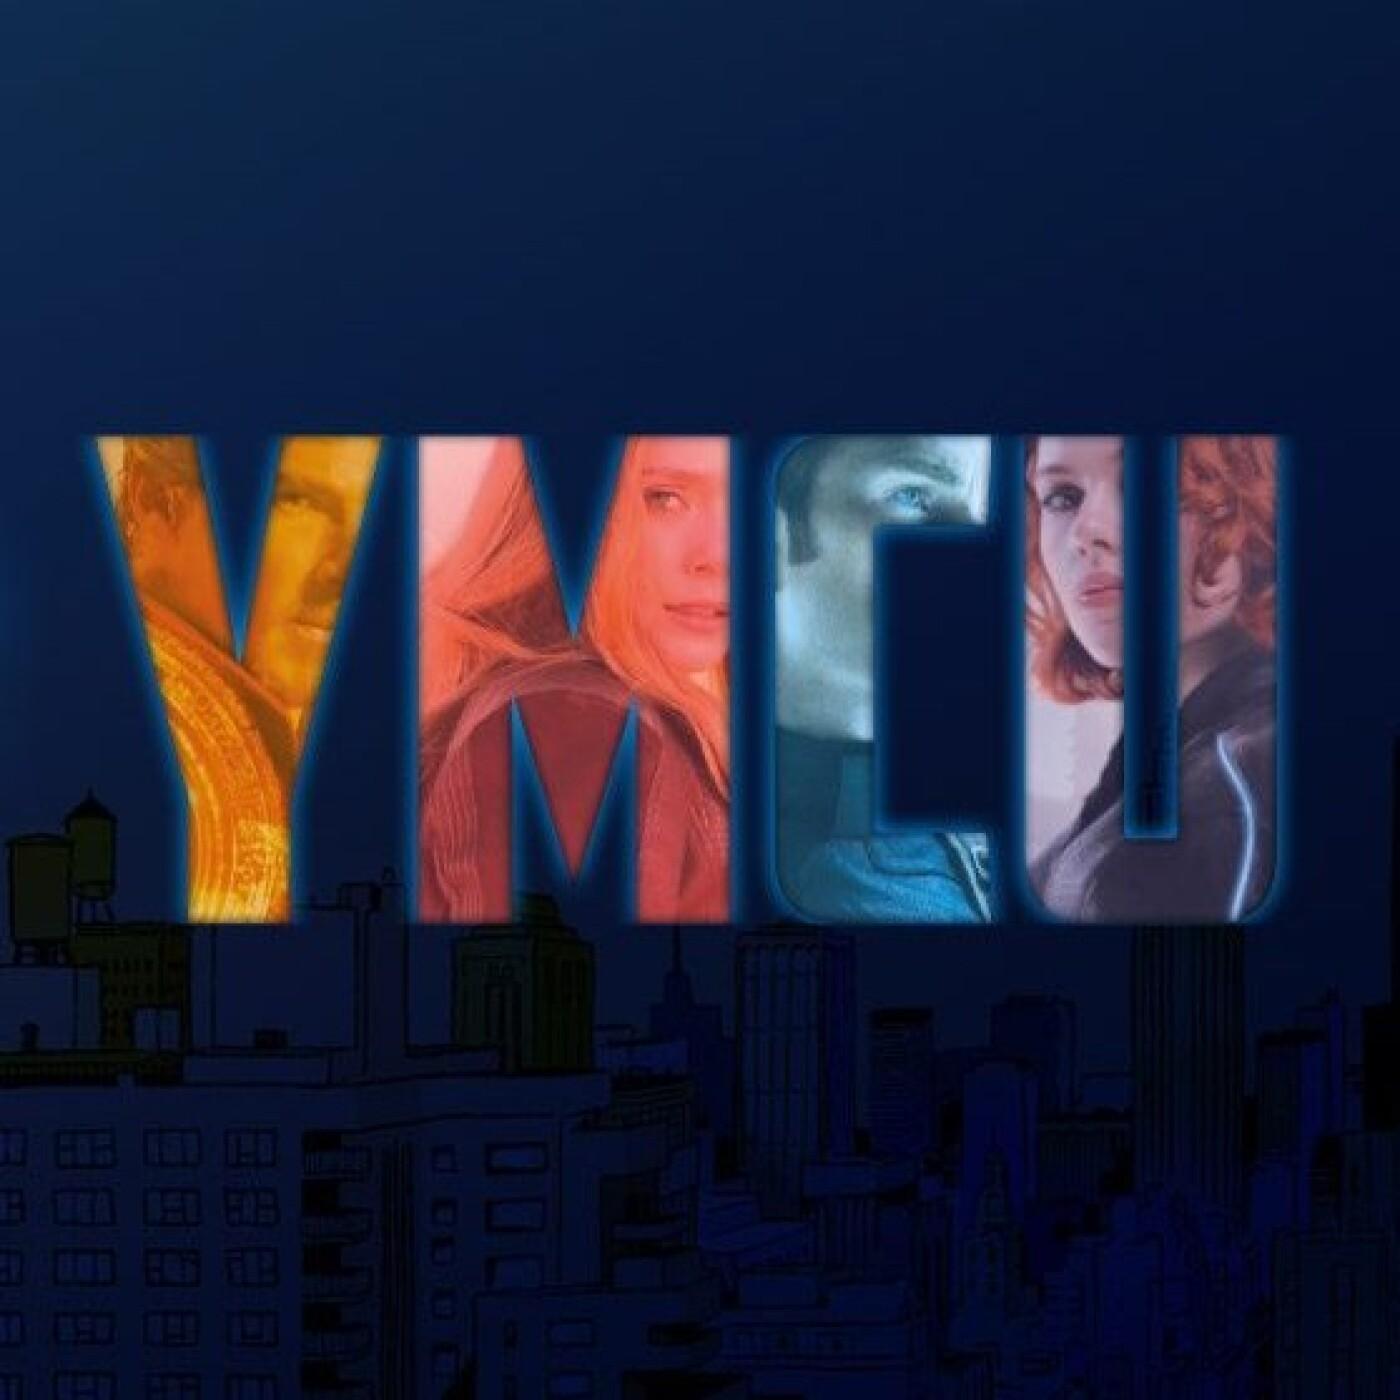 YMCU #8 - House of Sorrow (WandaVision épisode 8)